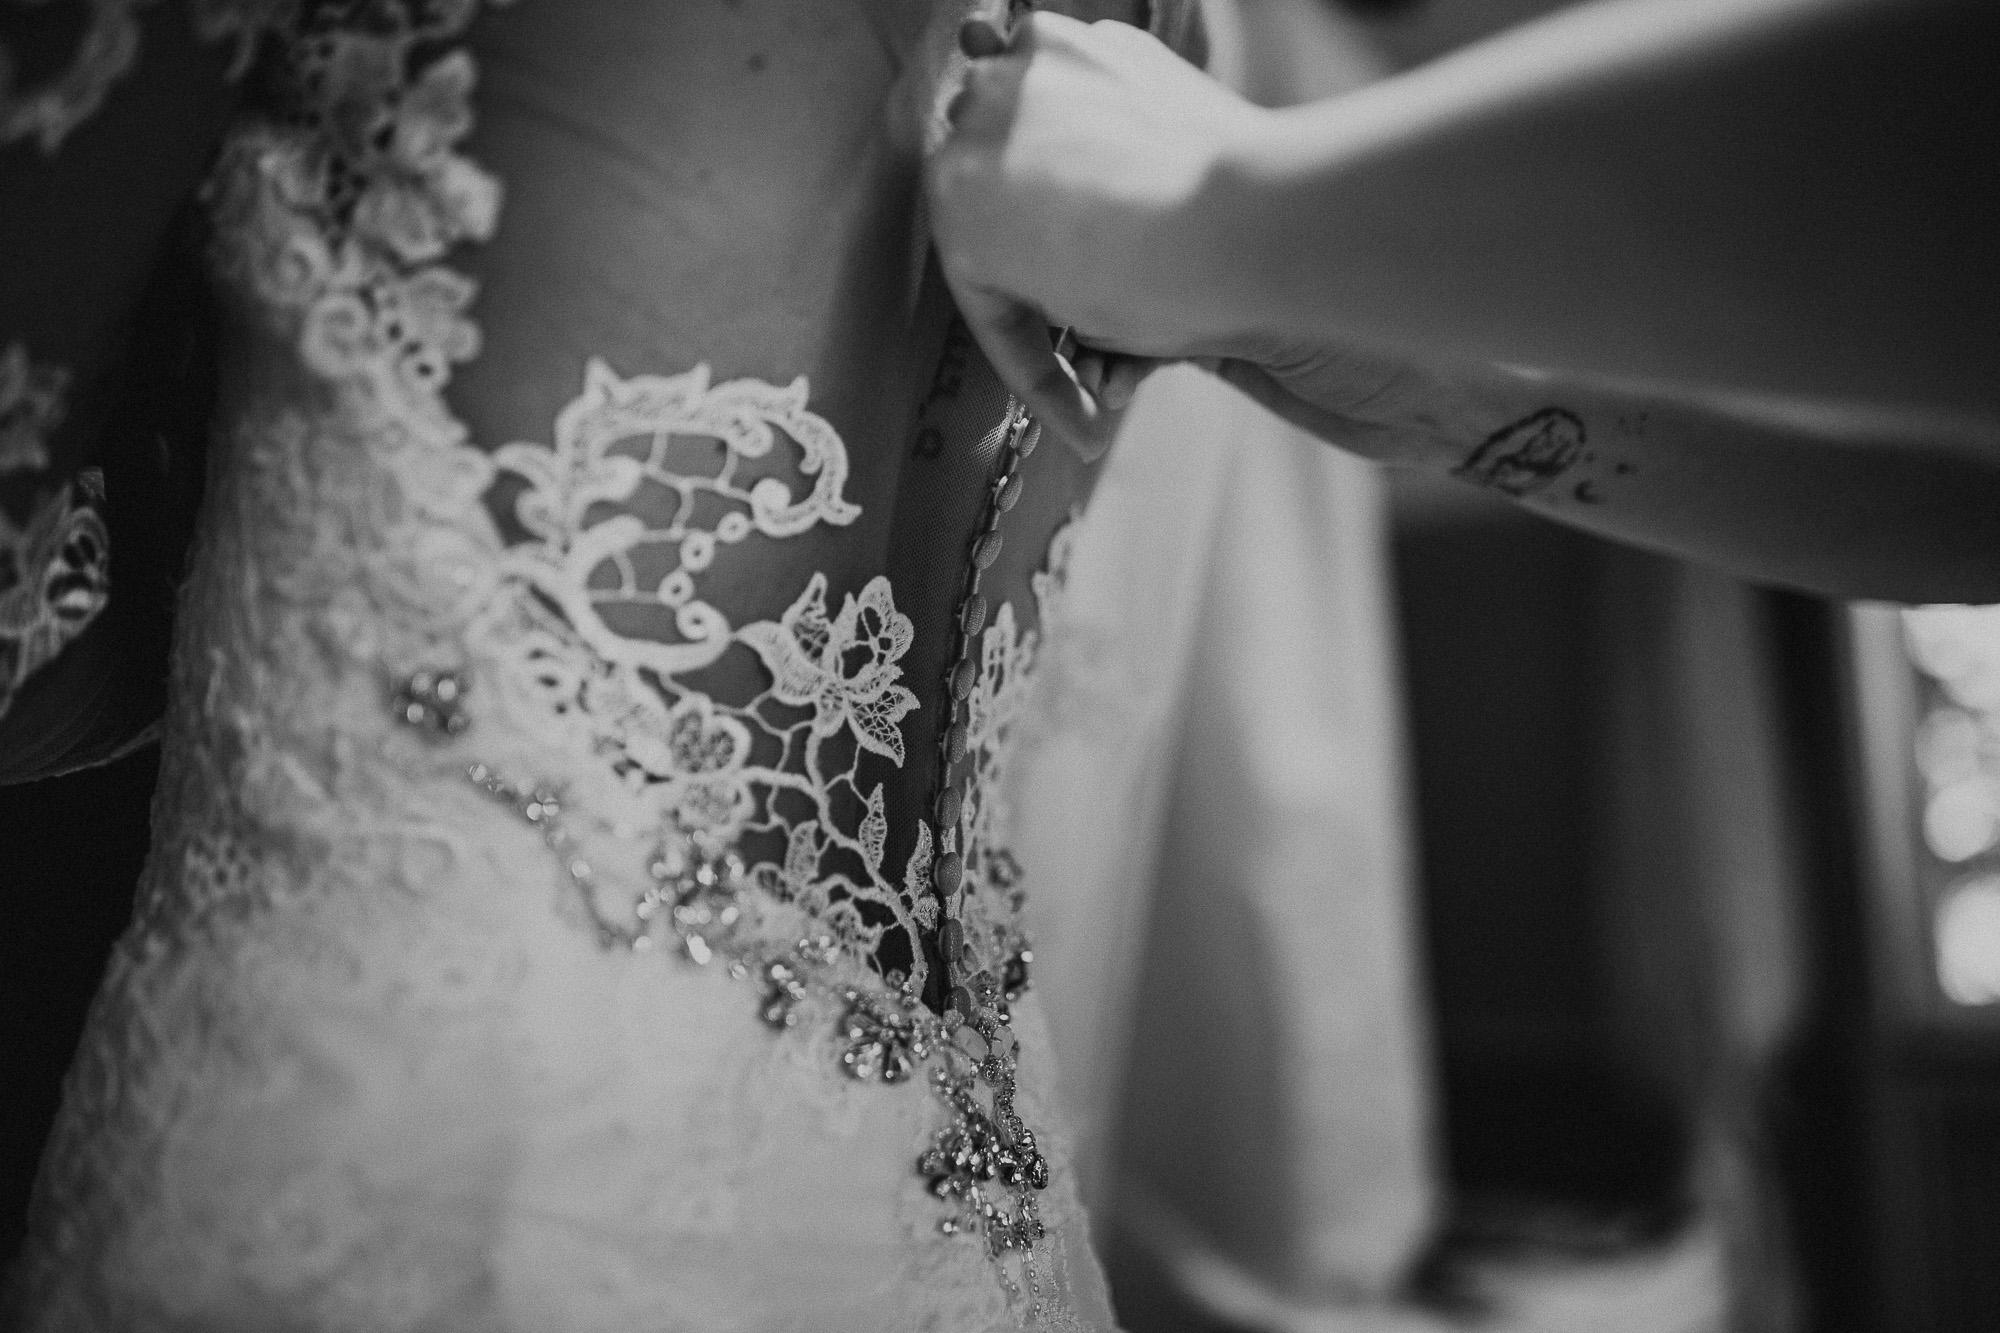 DanielaMarquardtPhotography_Hochzeitsfotograf_Düsseldorf_Köln_Mallorca_Bayern_Austria_Harz_Wedding_AileenundLennart_Weddingphotographer_Ibiza_Tuskany_Italien_Toskana_Portugal_Lissabon47